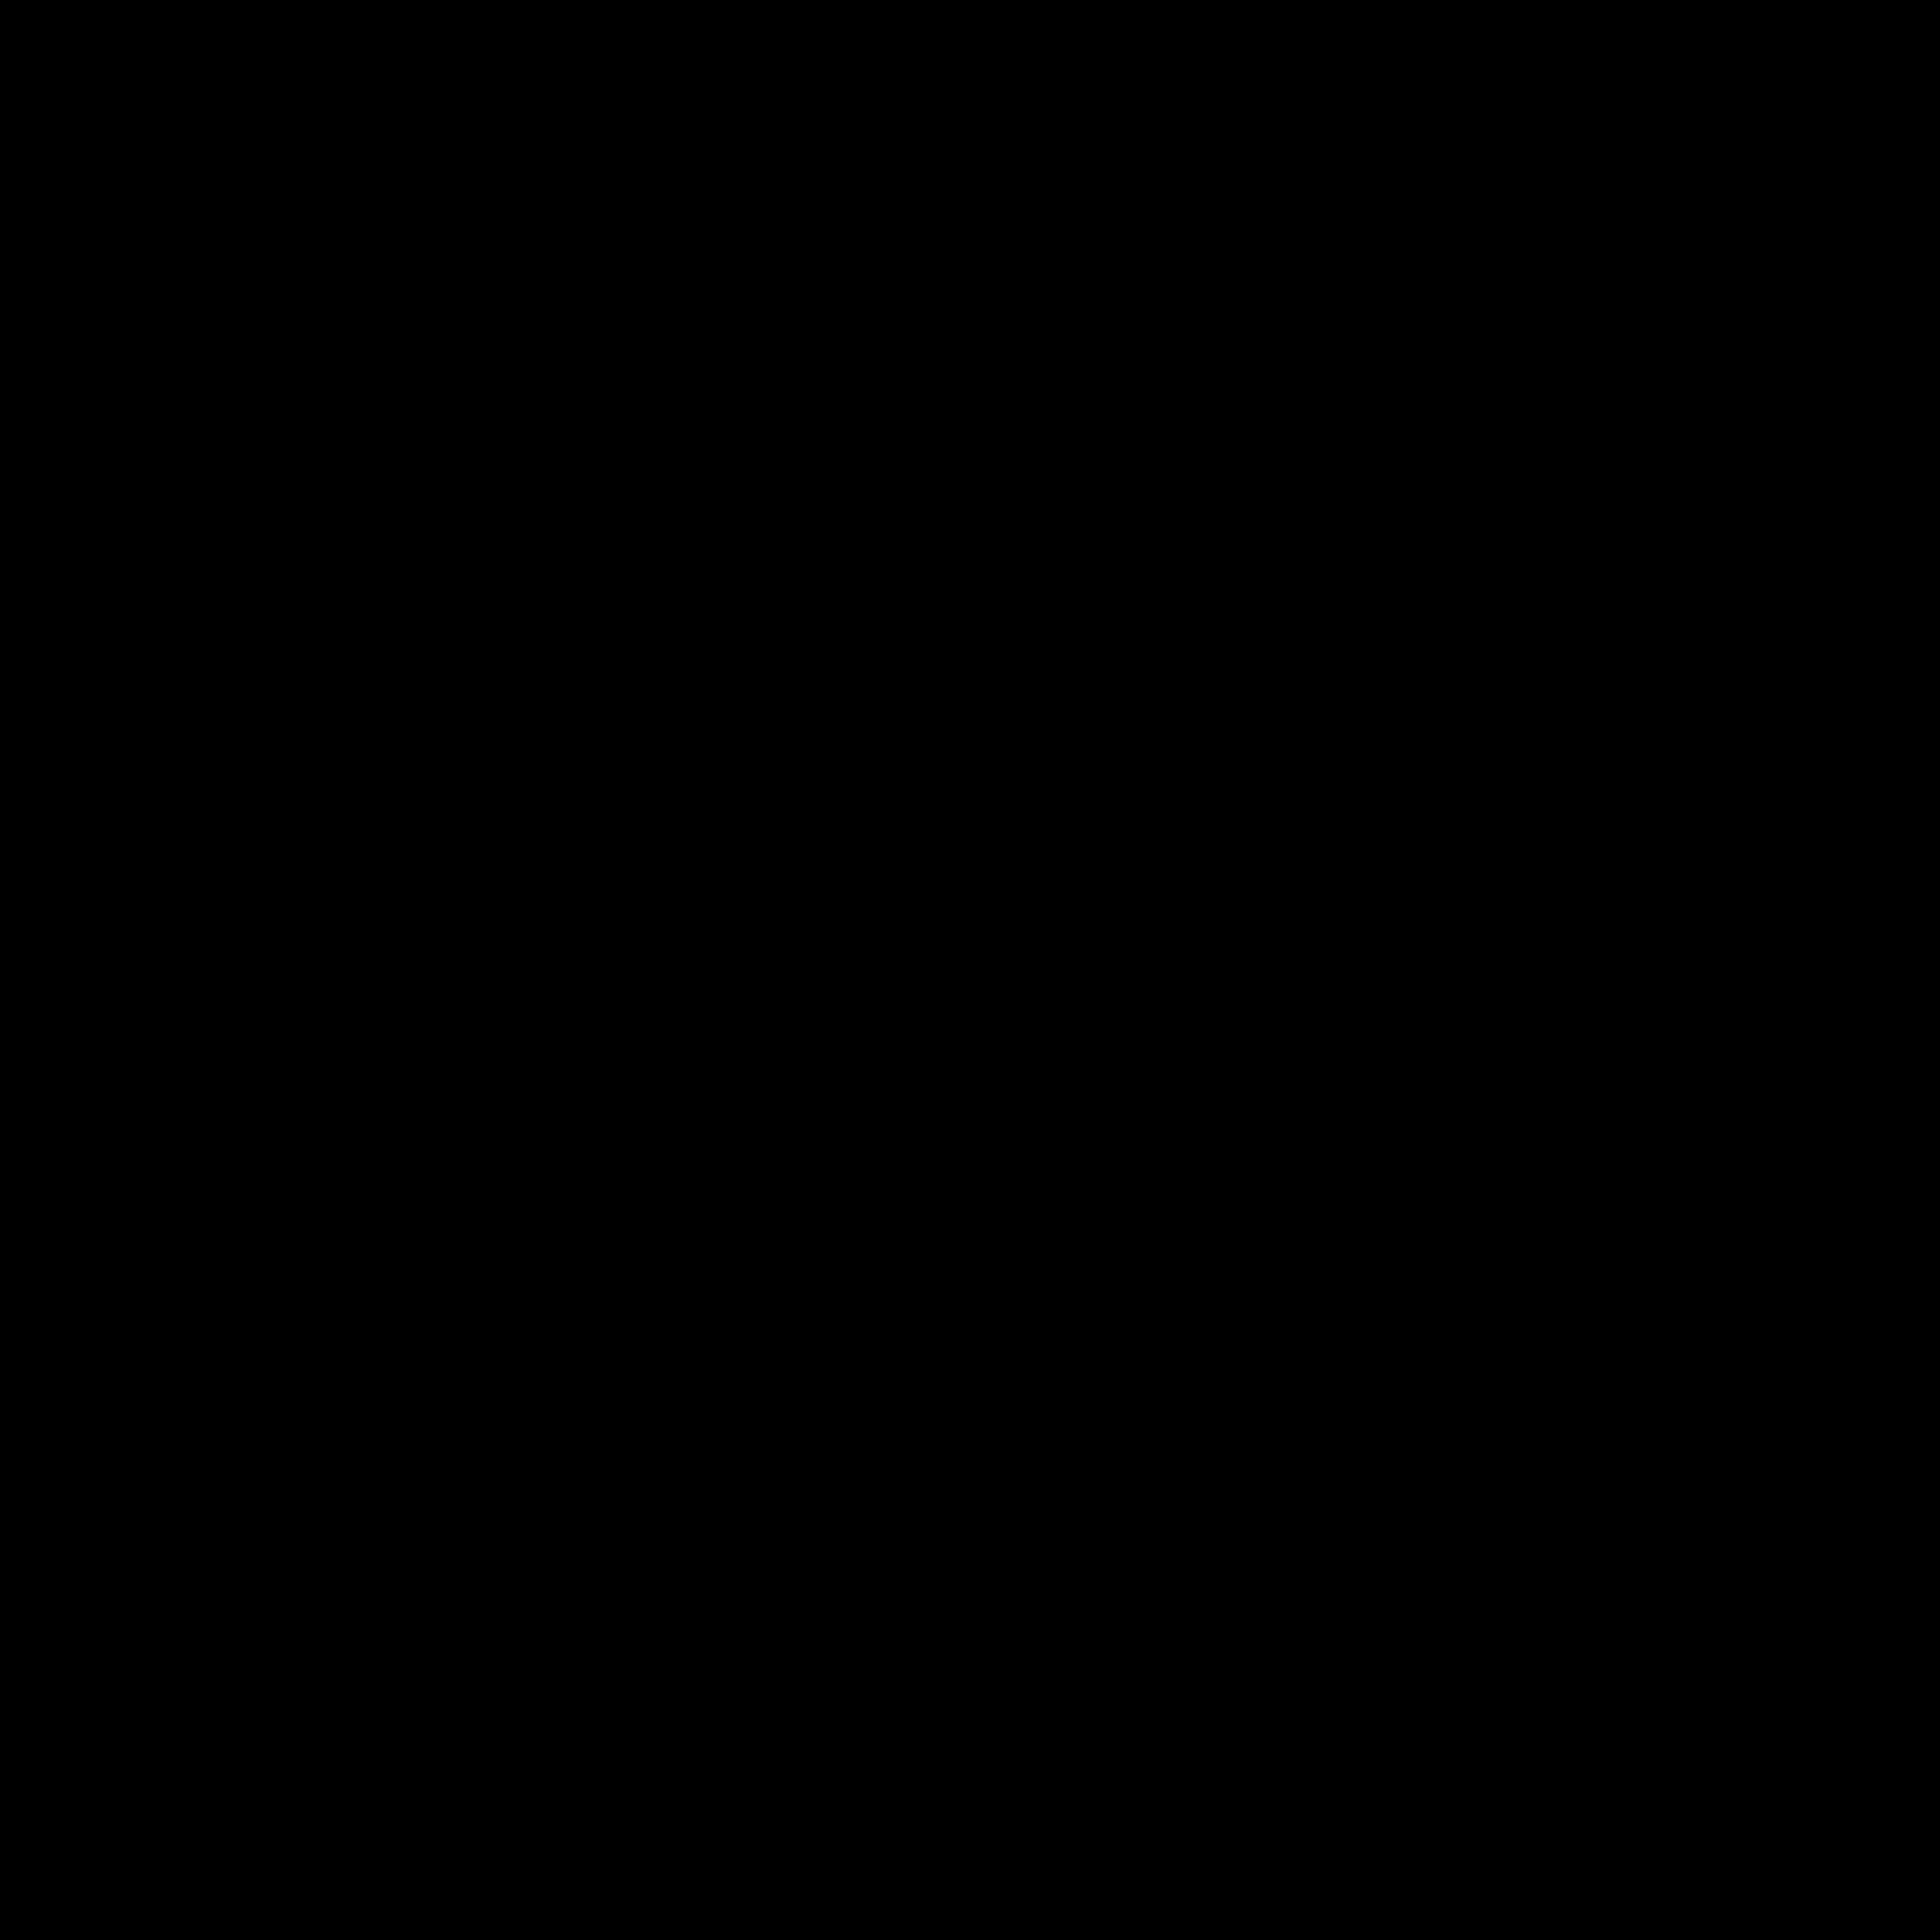 vector transparent bracket vector calligraphy #110109219